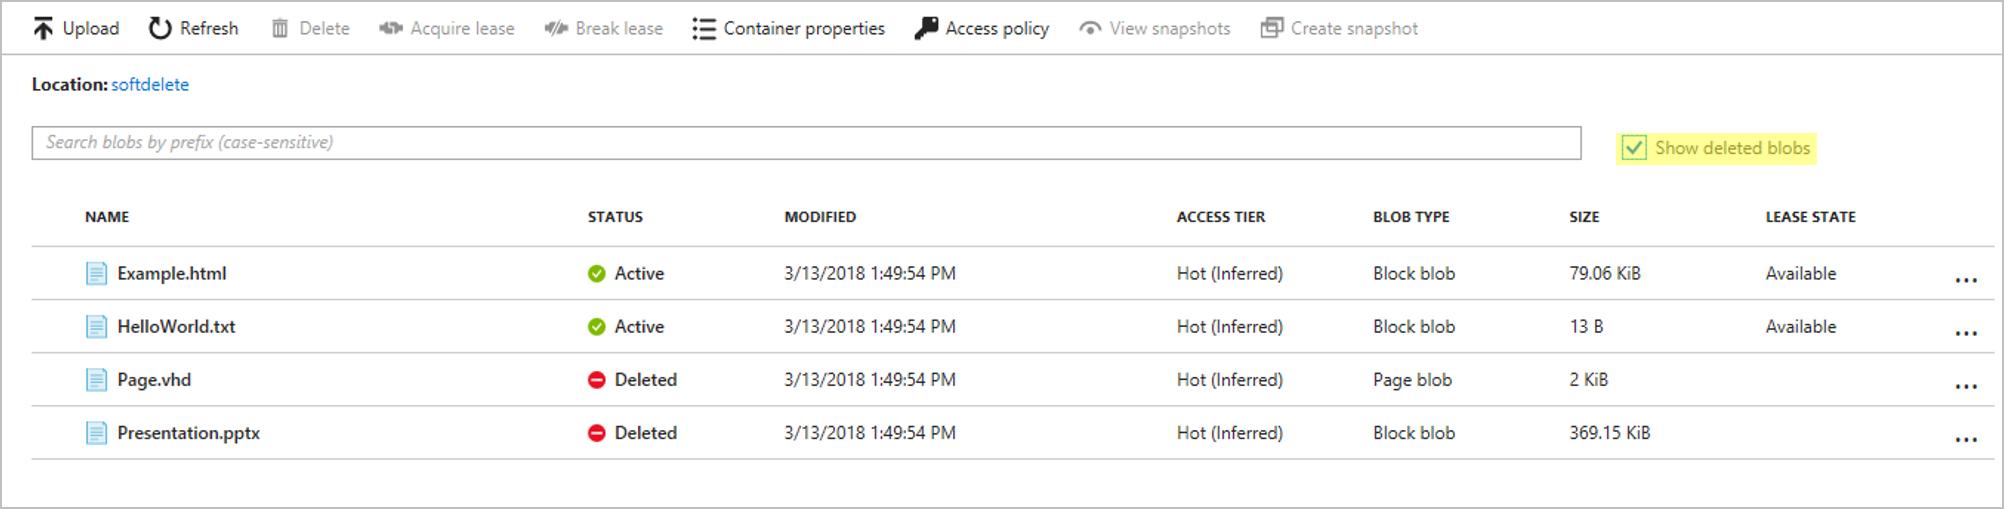 Soft delete for Azure Storage blobs | Microsoft Docs